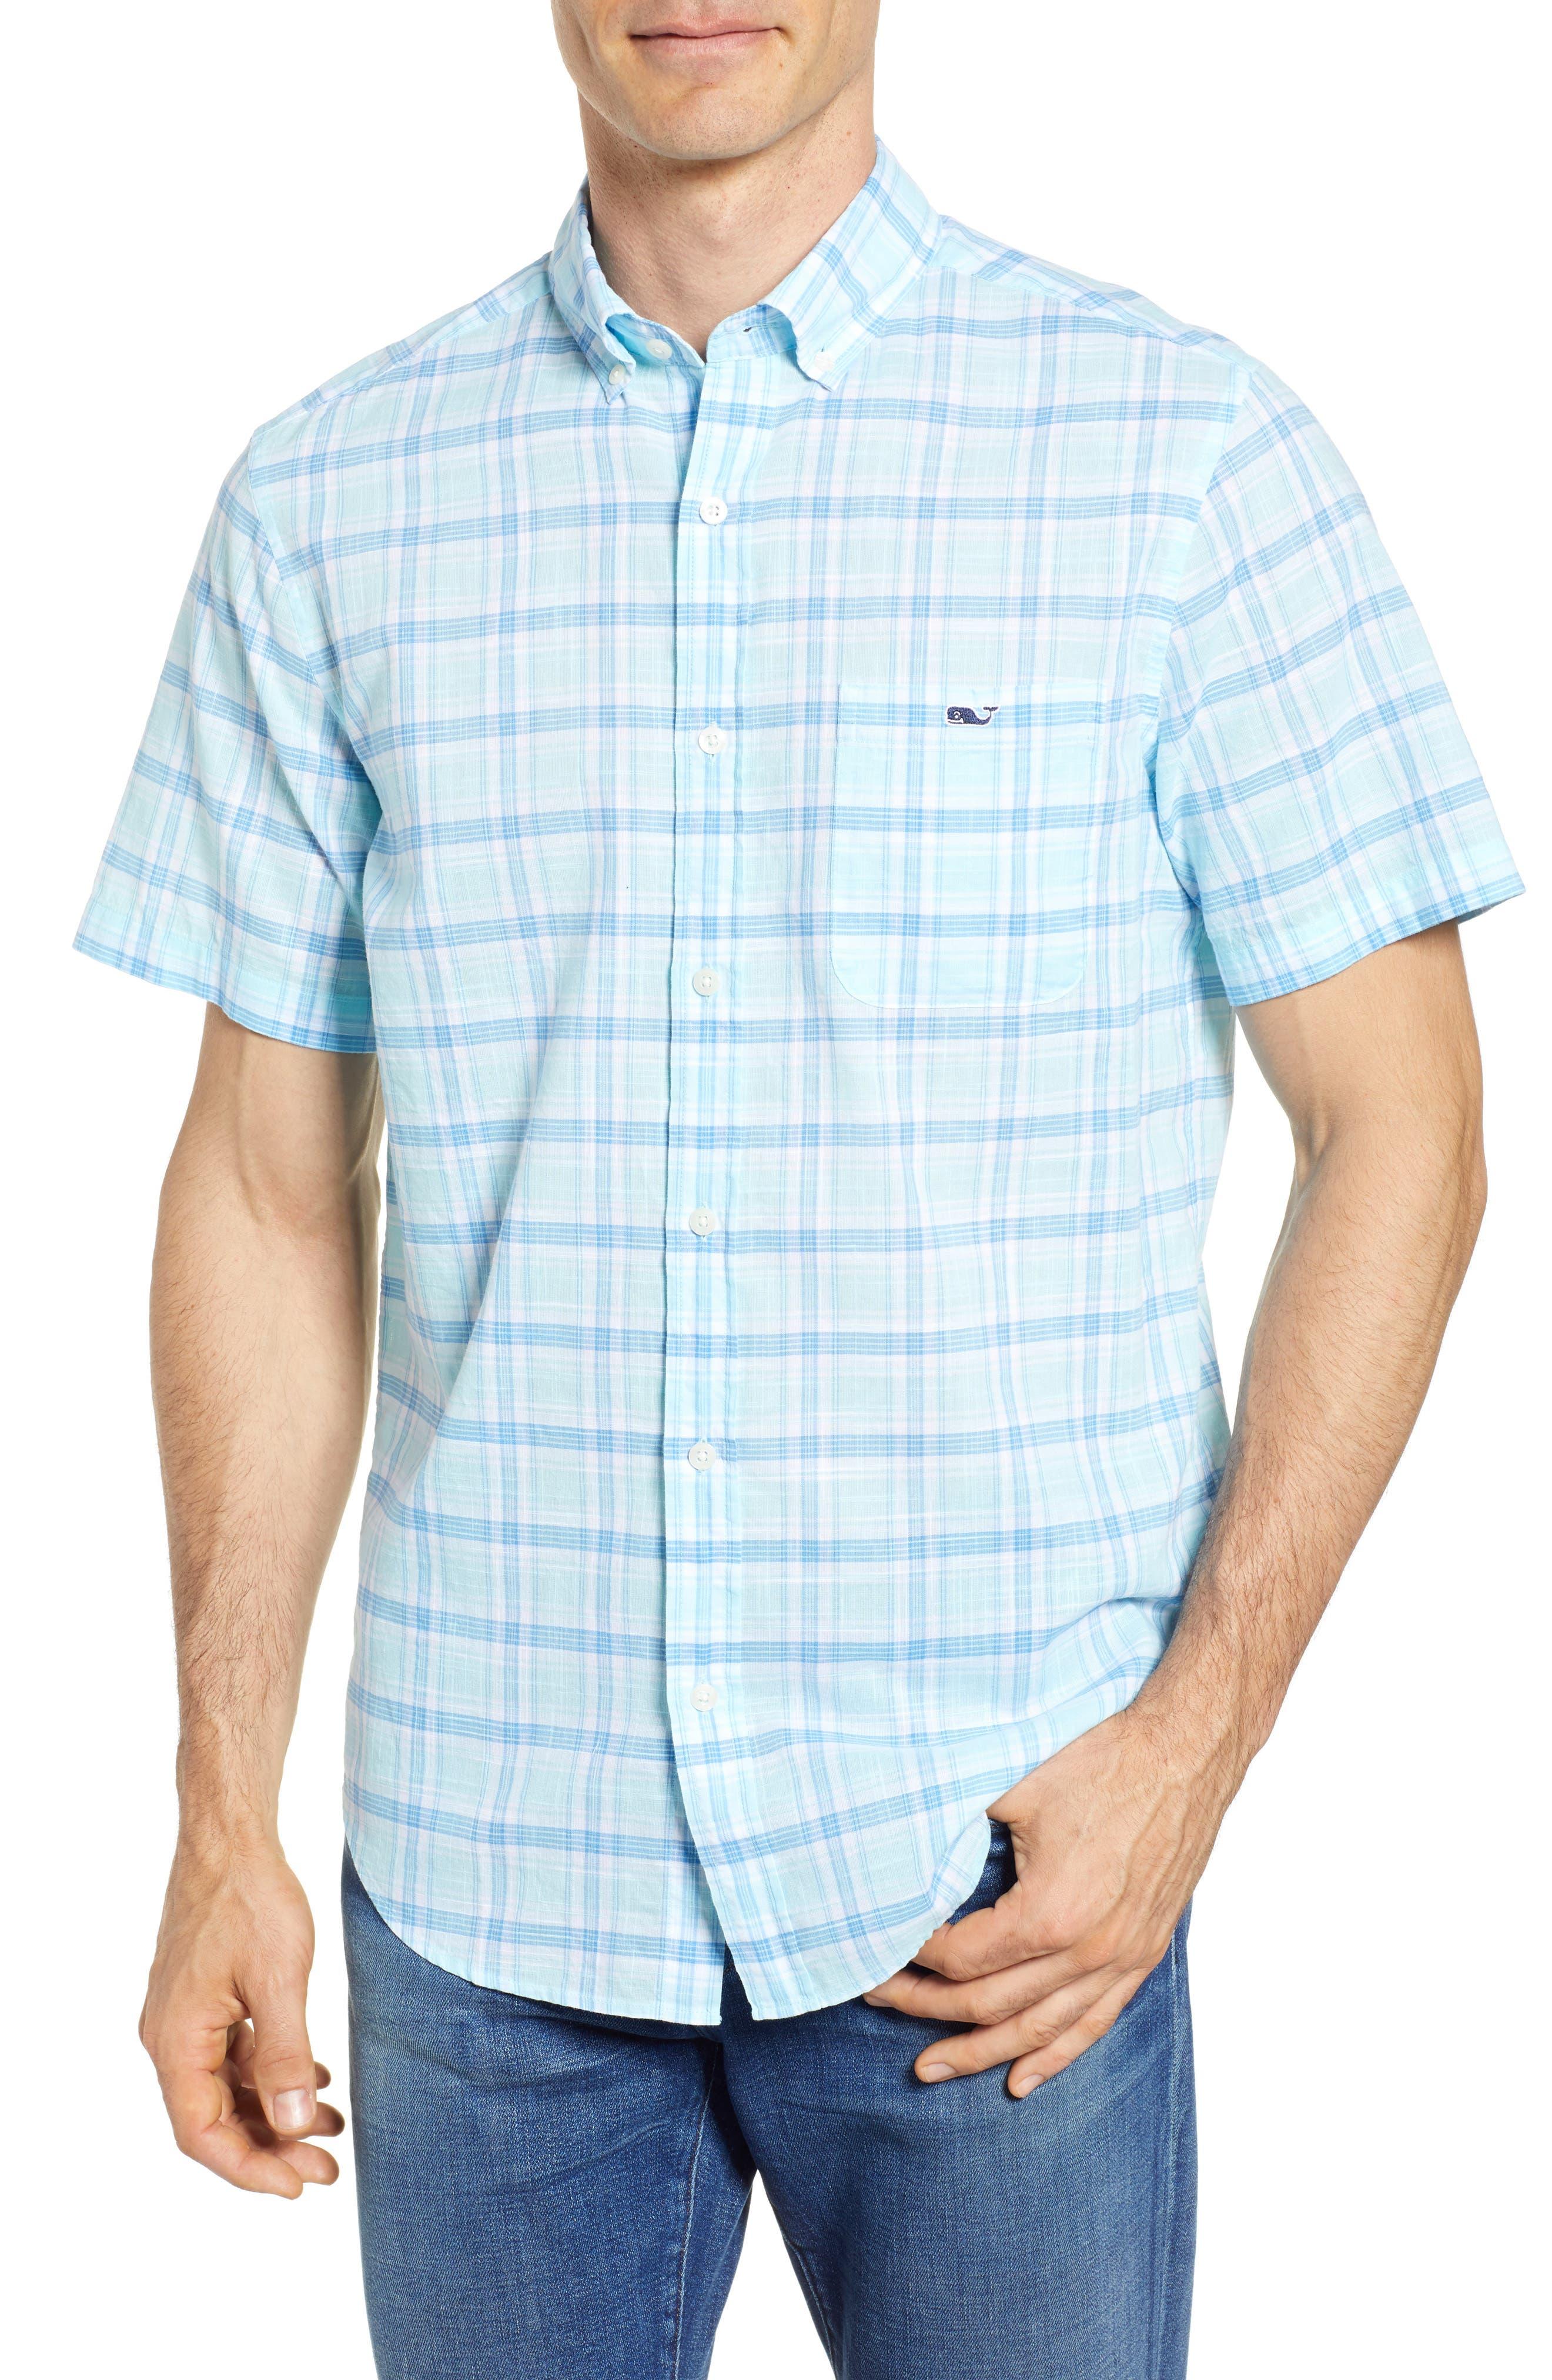 Pleasant Bay Classic Fit Plaid Sport Shirt,                             Main thumbnail 1, color,                             437